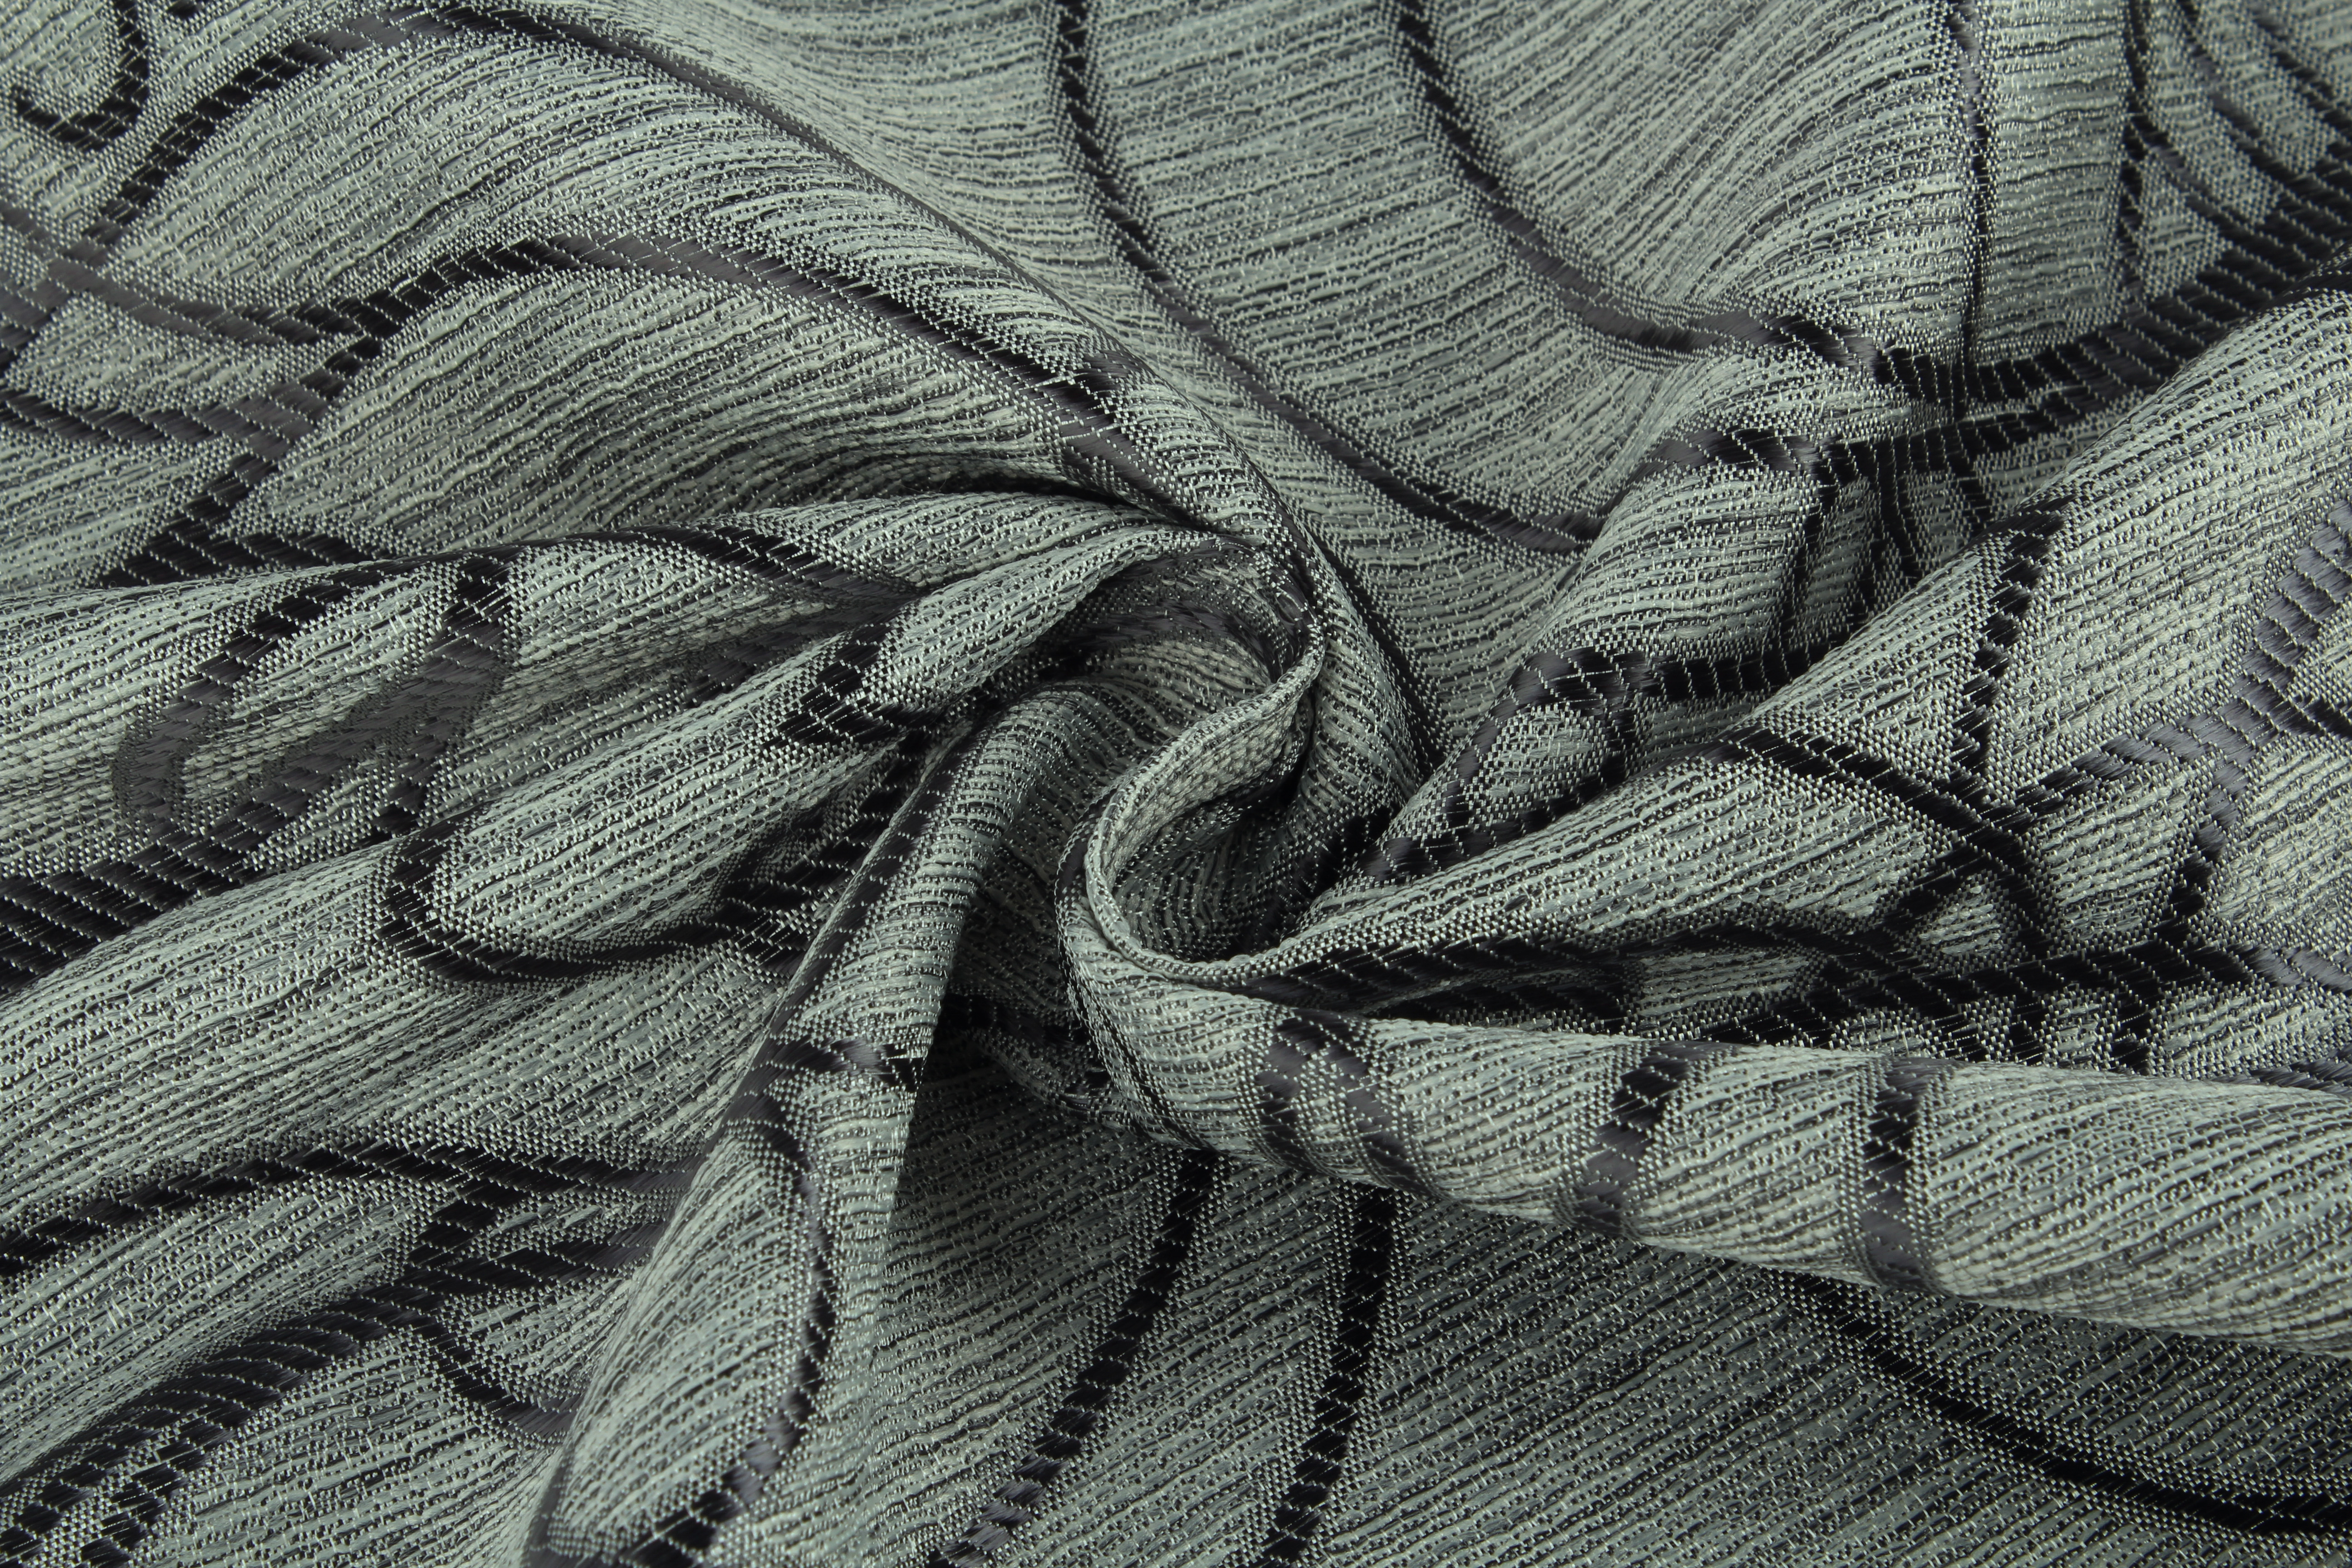 {} TexRepublic Материал Жаккард Romance Цвет: Серый серый вислоухий котнок цена